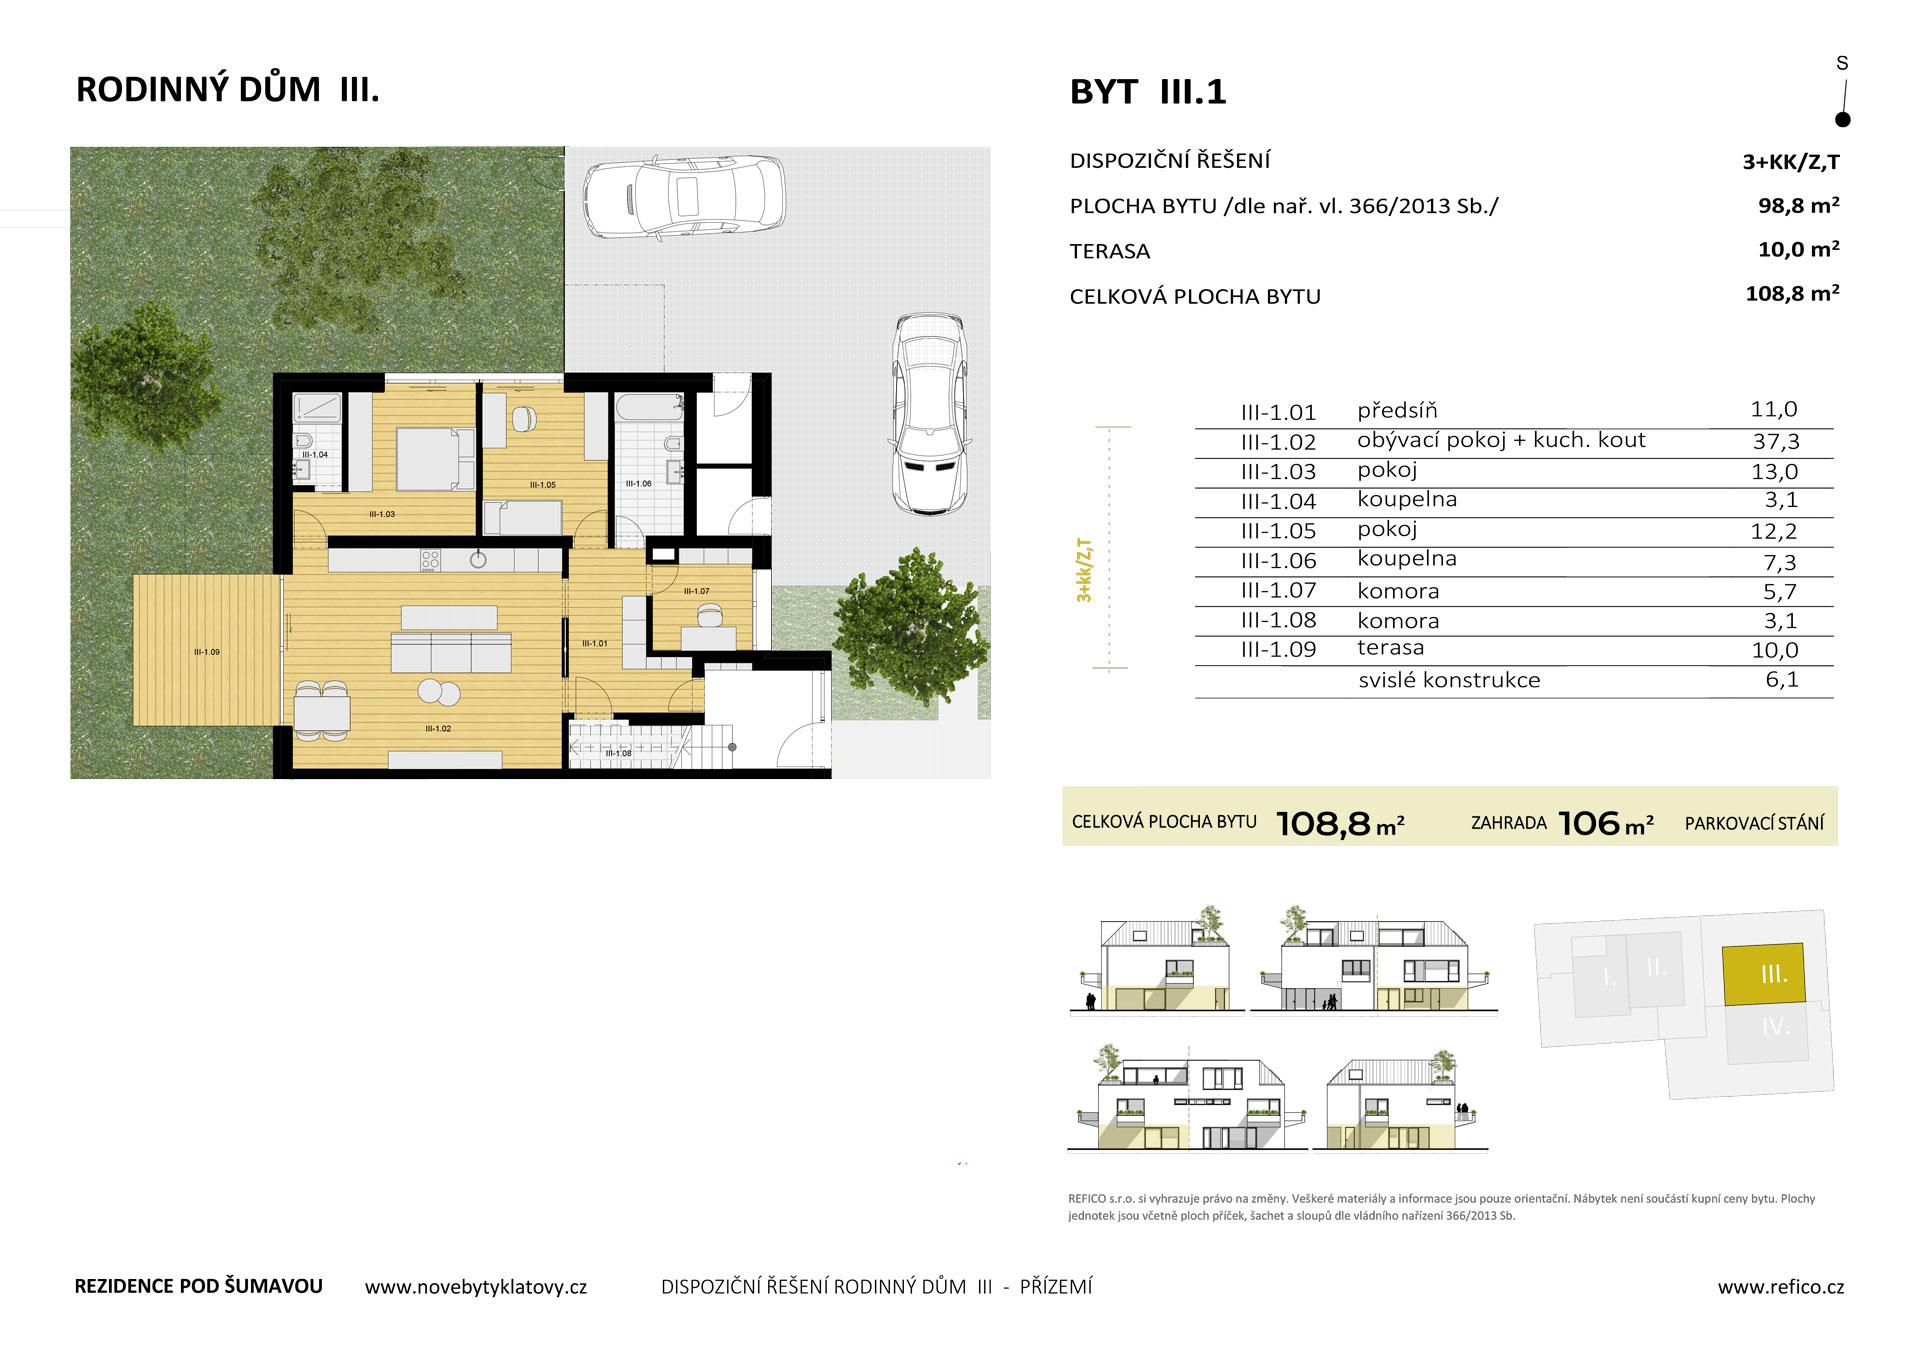 Dům III., byt 1, přízemí, 3+KK/Z,T